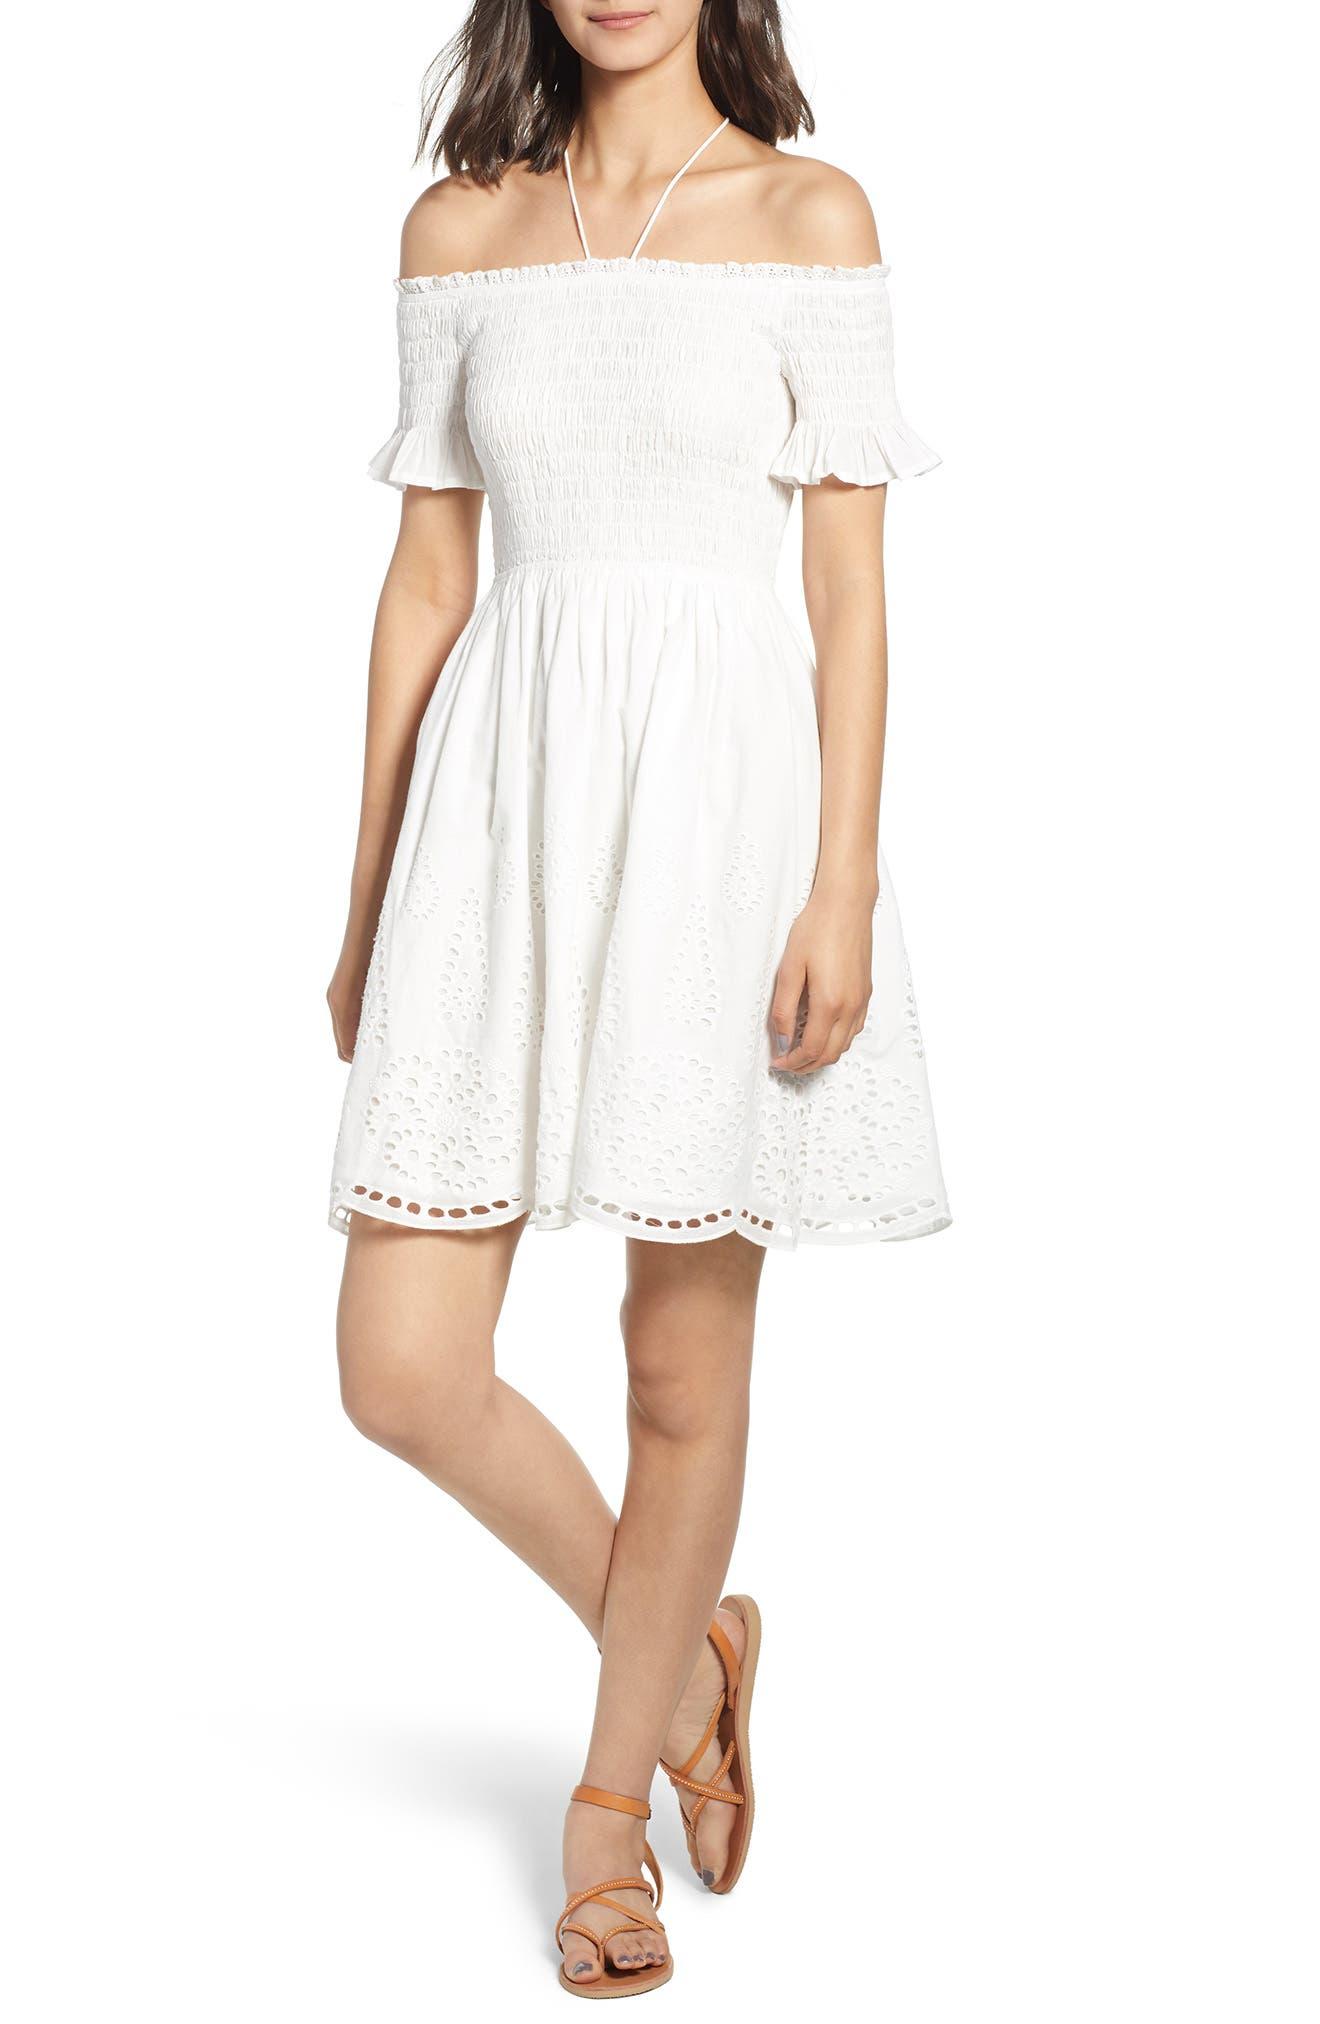 Smocked Off the Shoulder Dress,                             Main thumbnail 1, color,                             WHITE EYELET